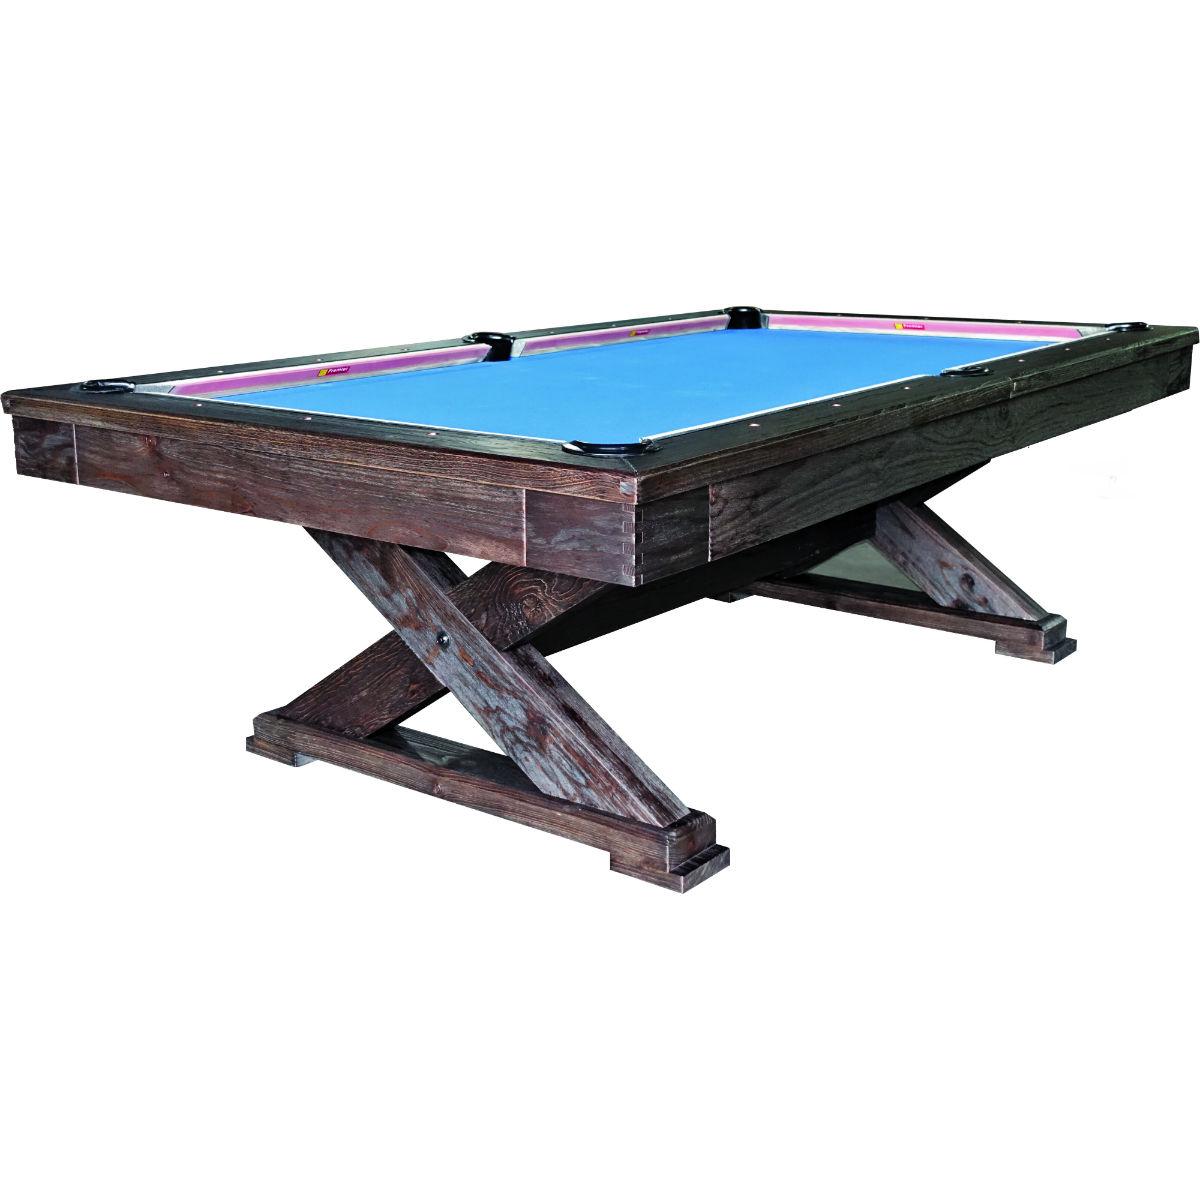 Beringer – The Champlain 8′ Pool Table